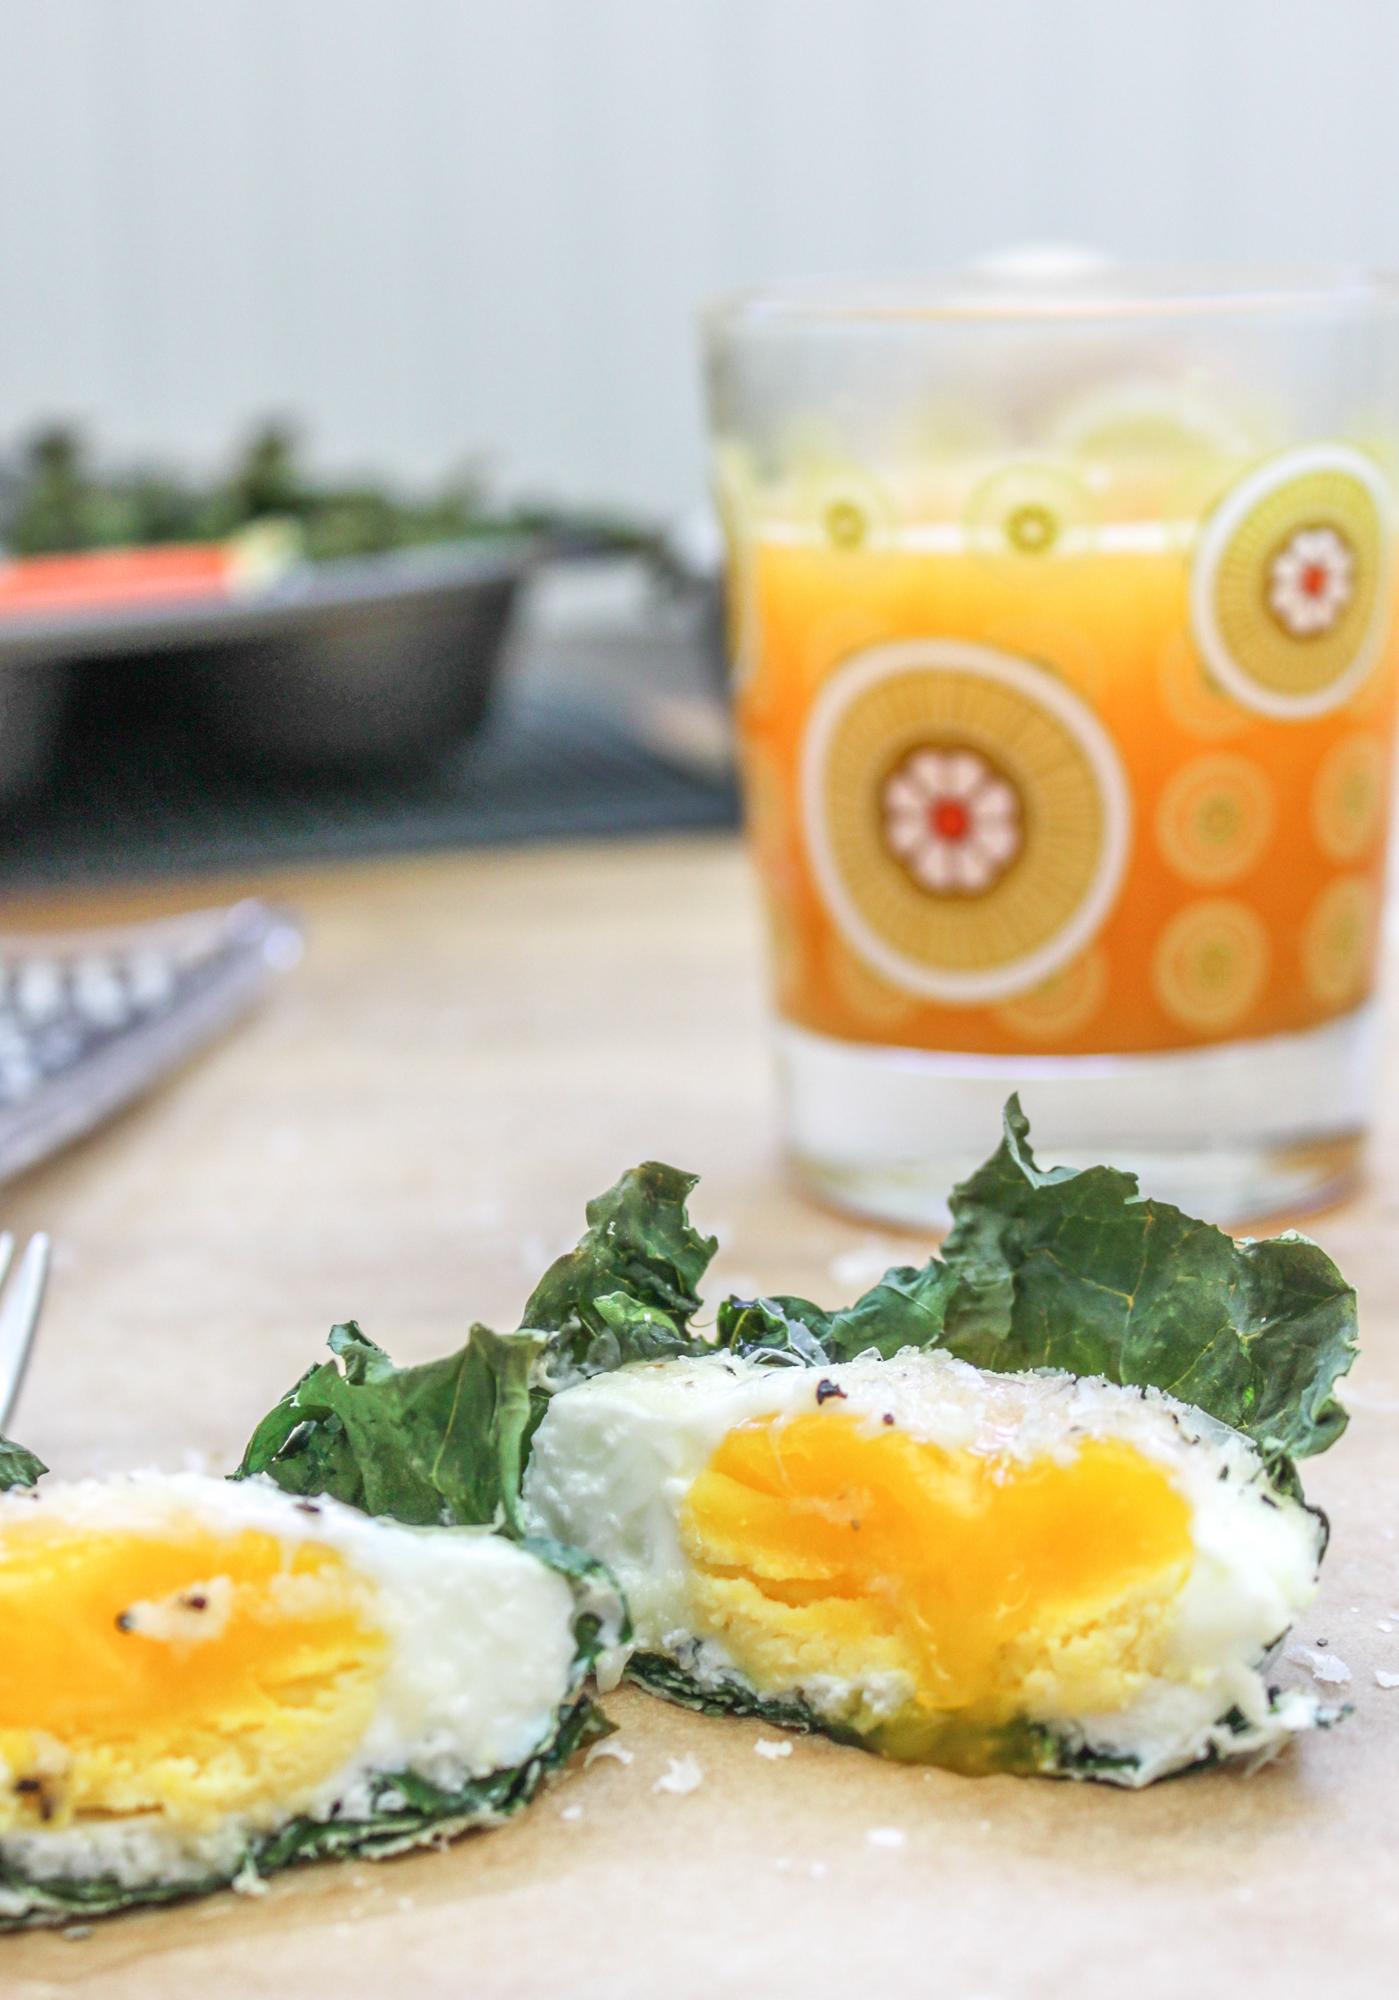 Kale Baked Eggs 2 3